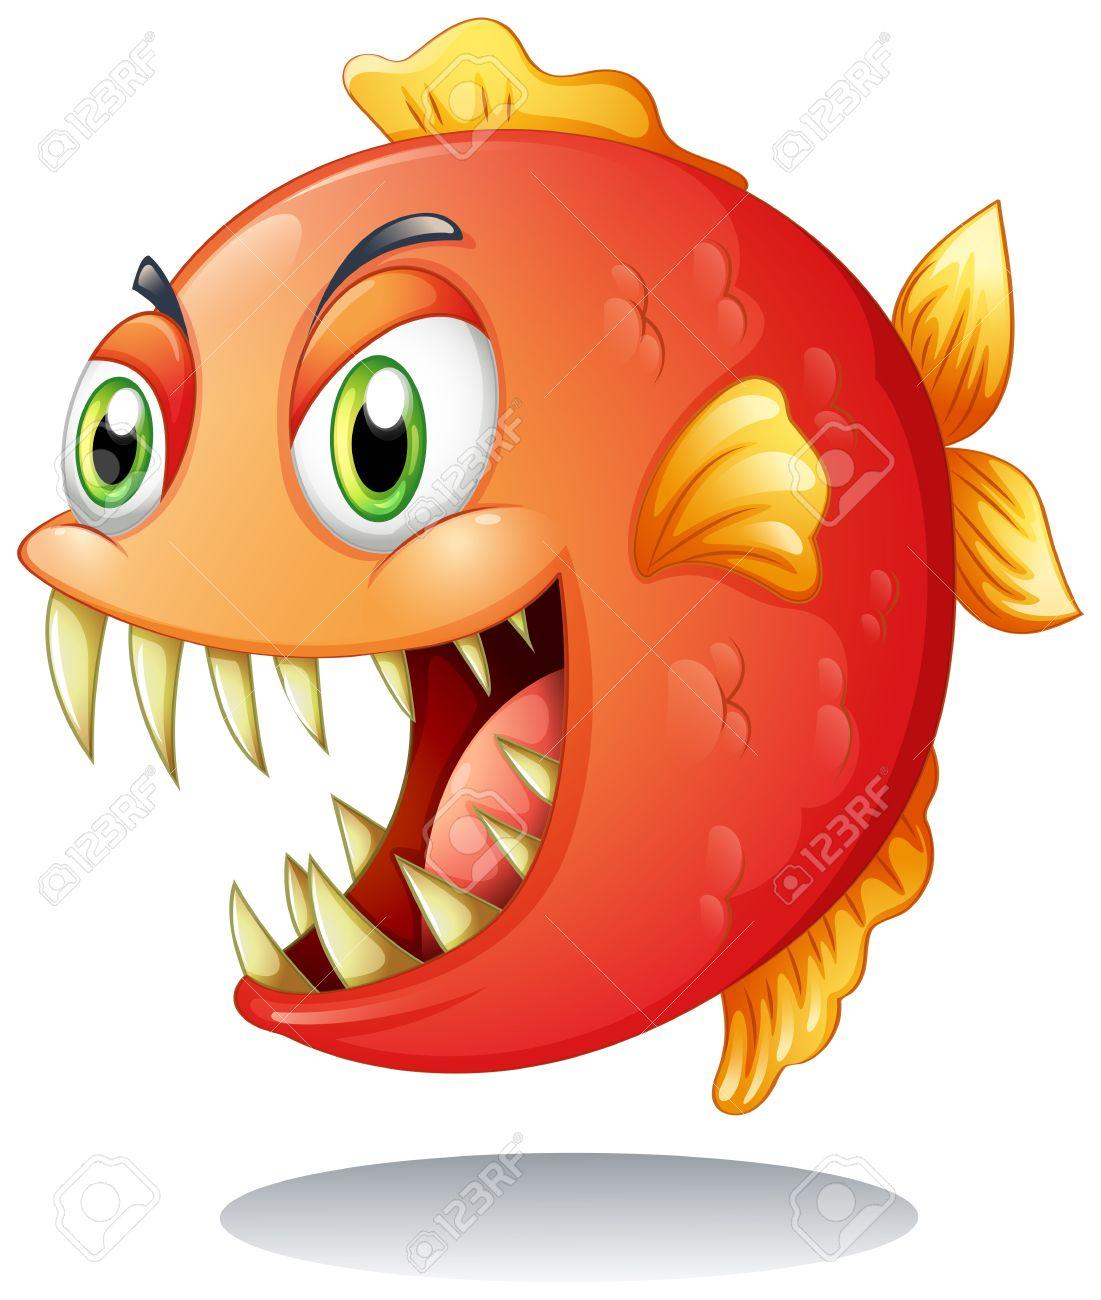 Piranha clipart #13, Download drawings